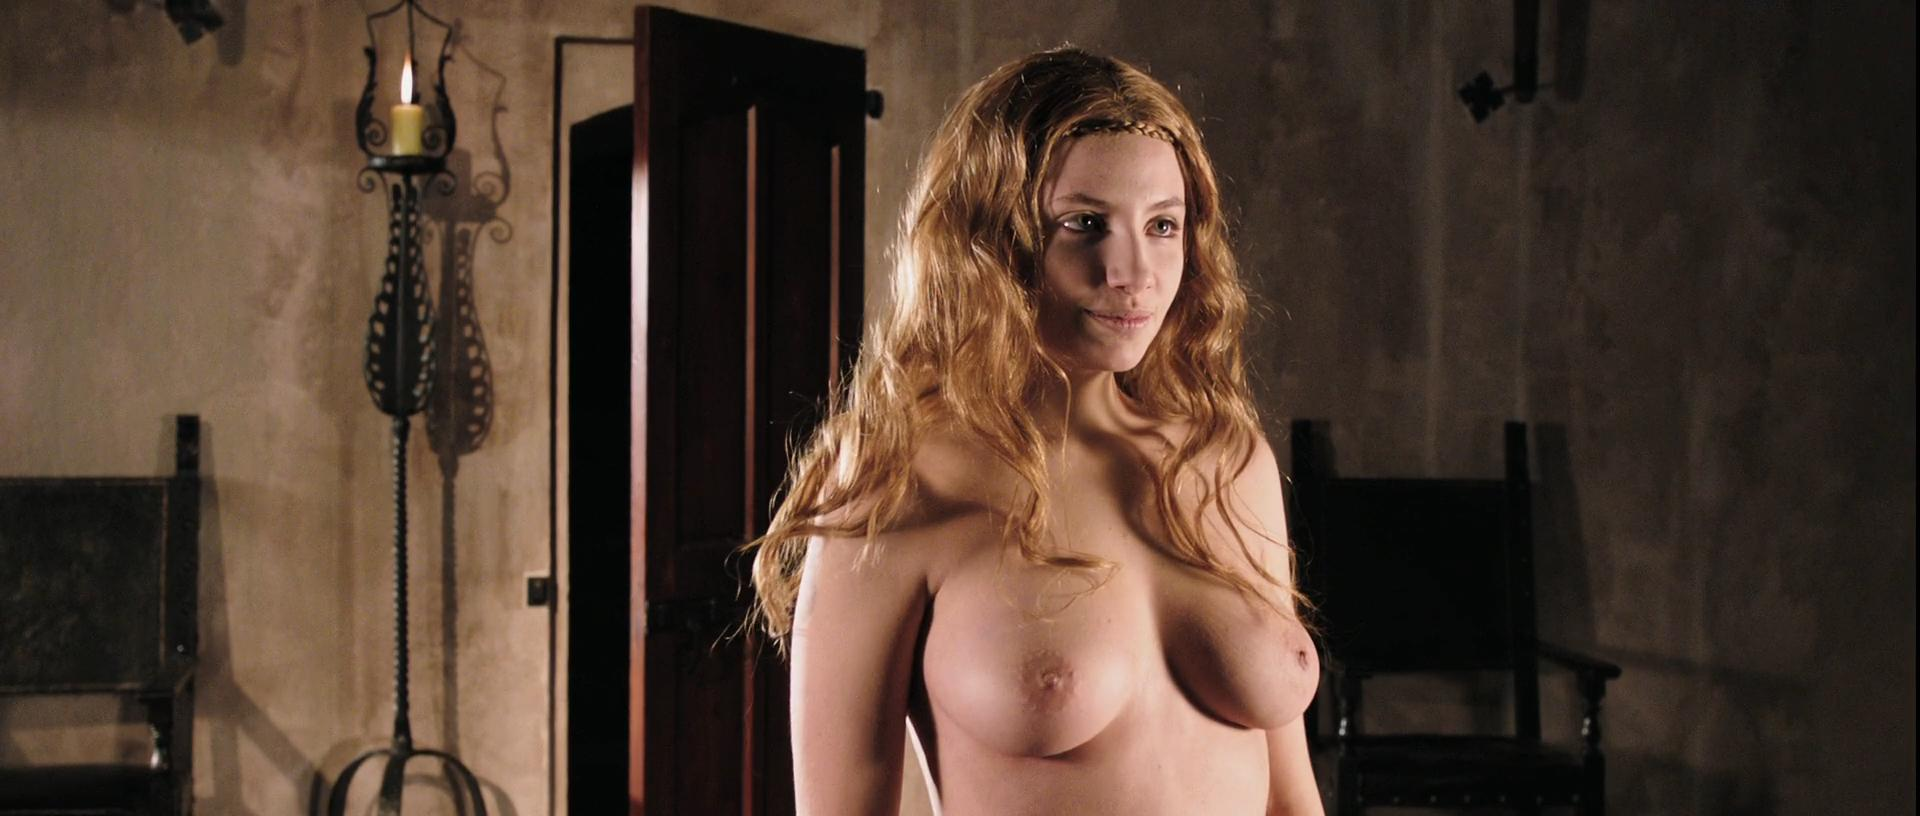 fotos Miriam Giovanelli desnuda 1